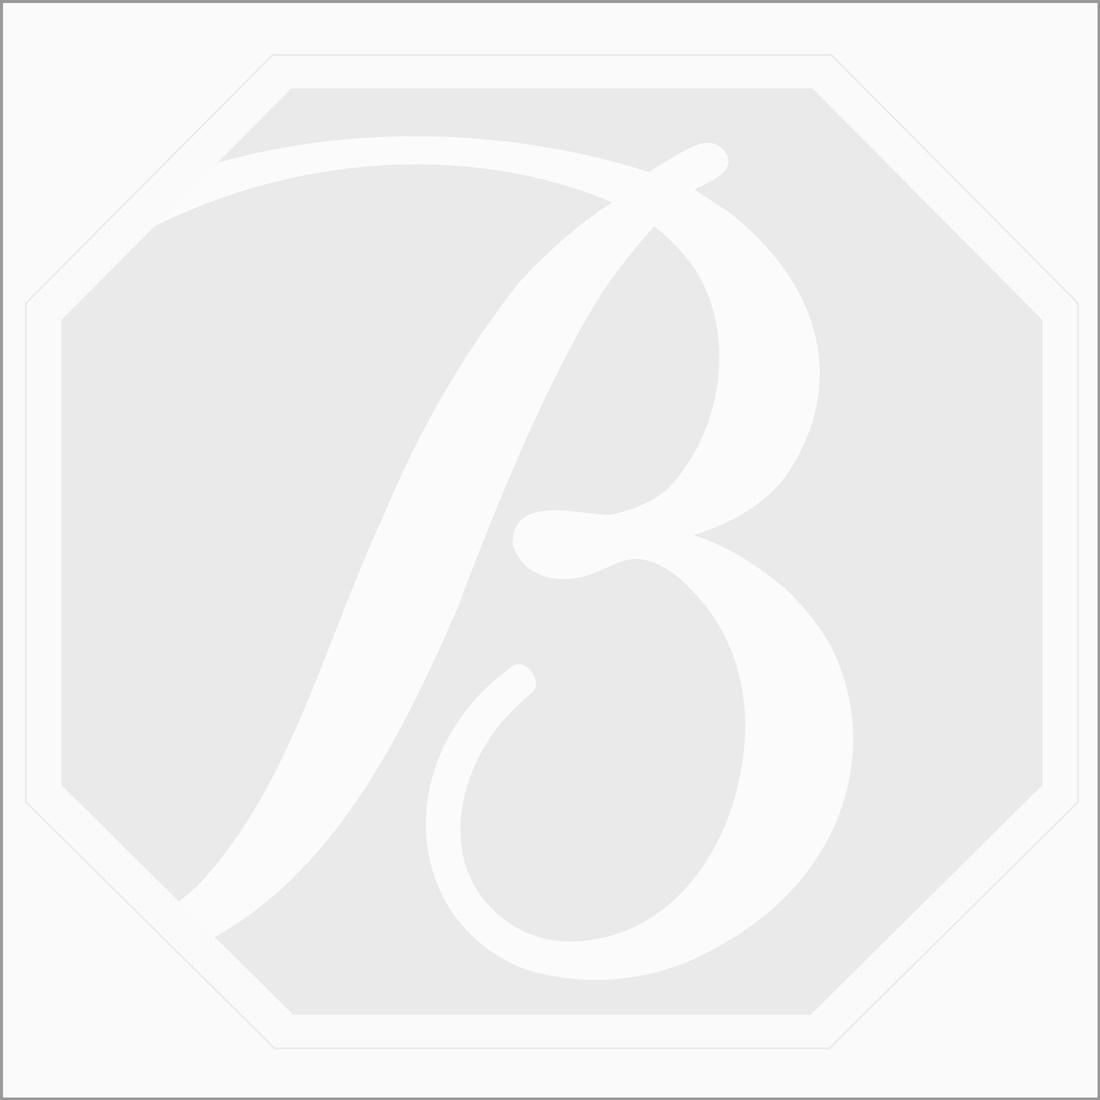 19 x 10 mm - Watermelon (Bi-Color) Tourmaline Carving - 8.50 carats (ToCarv1036)